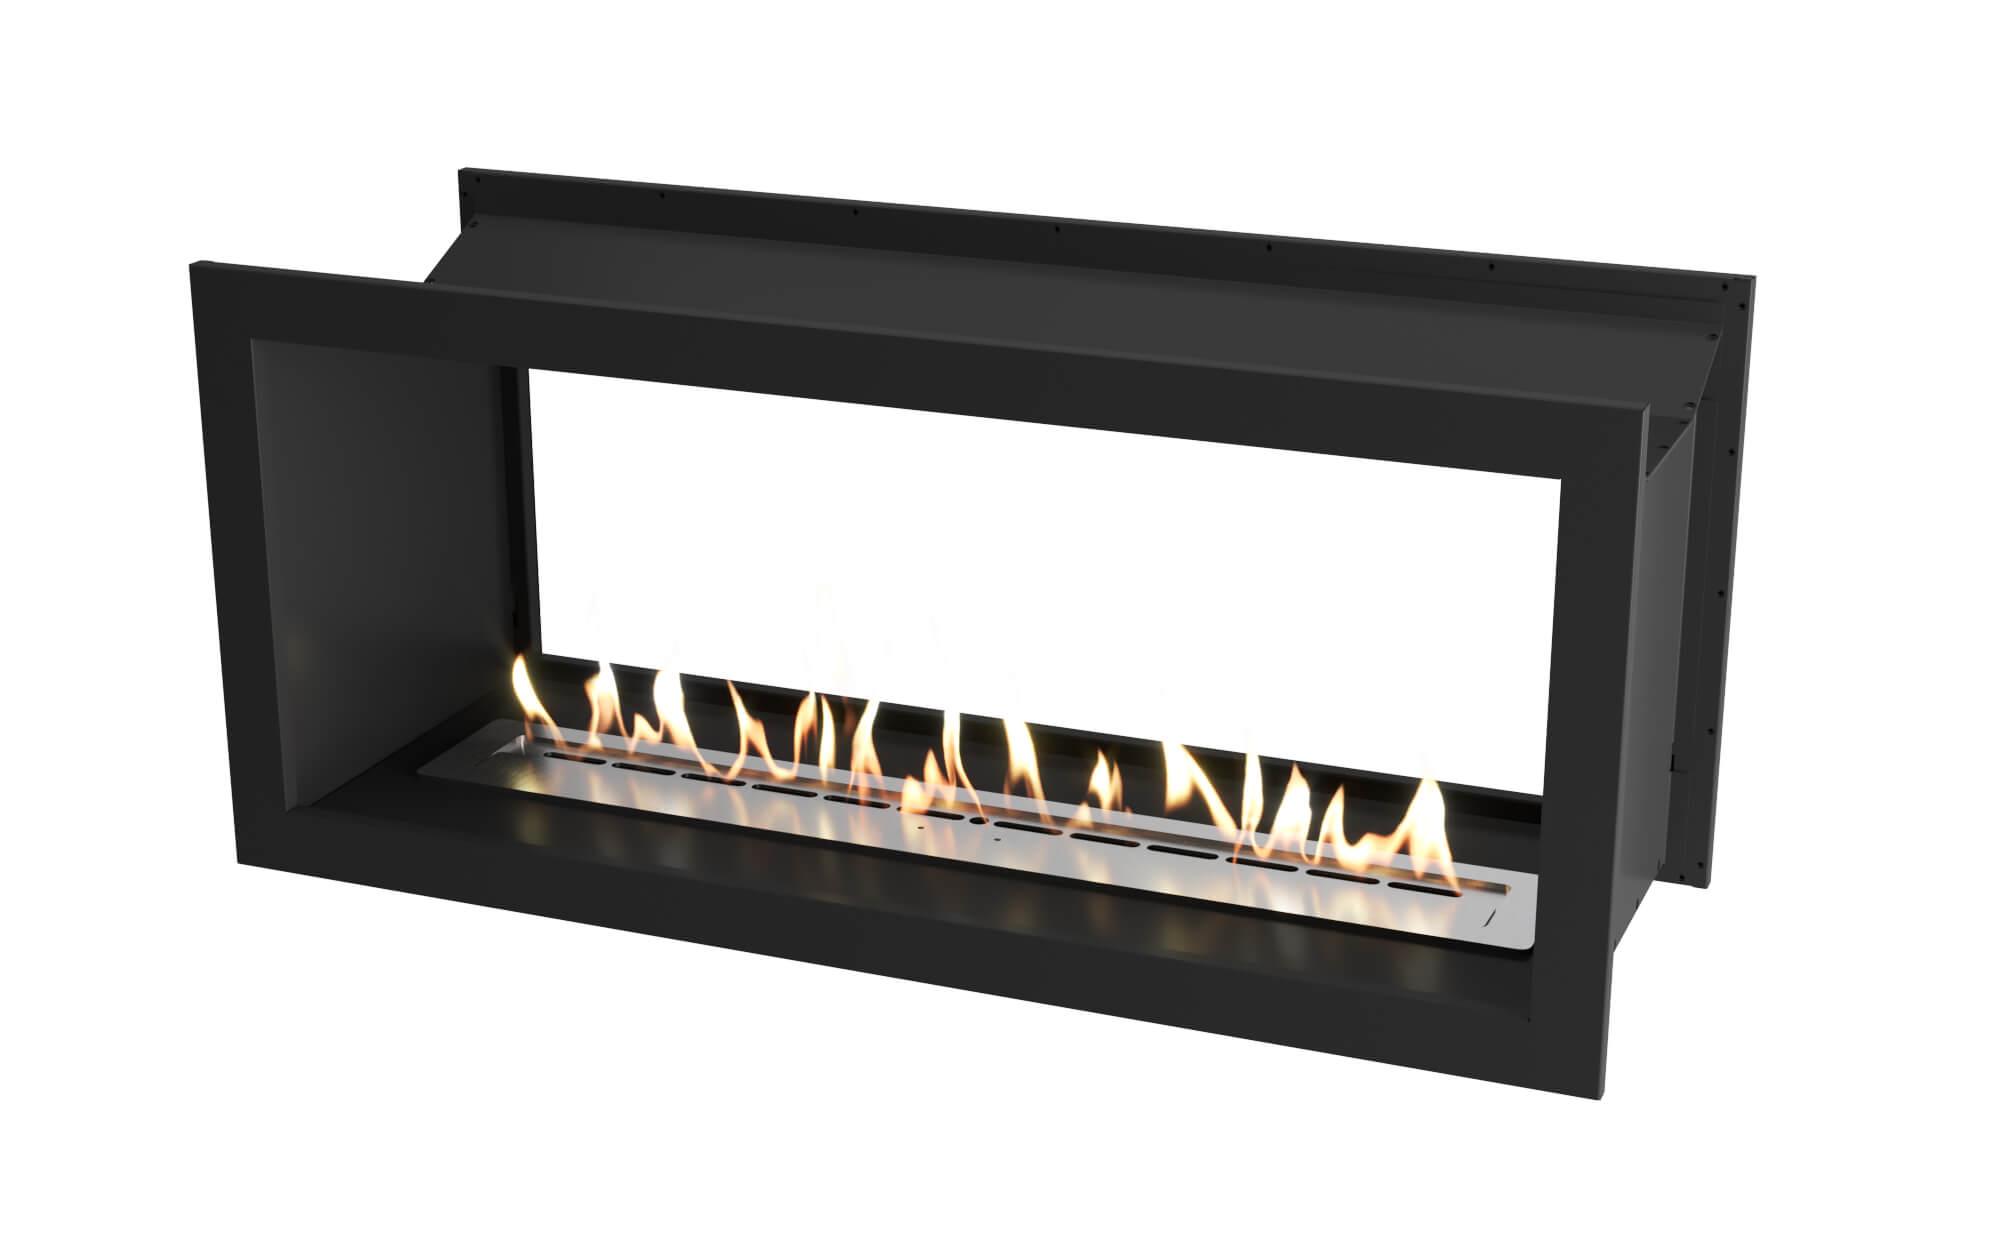 1350 Black double sided firebox with 1100 slimline bio fuel burner